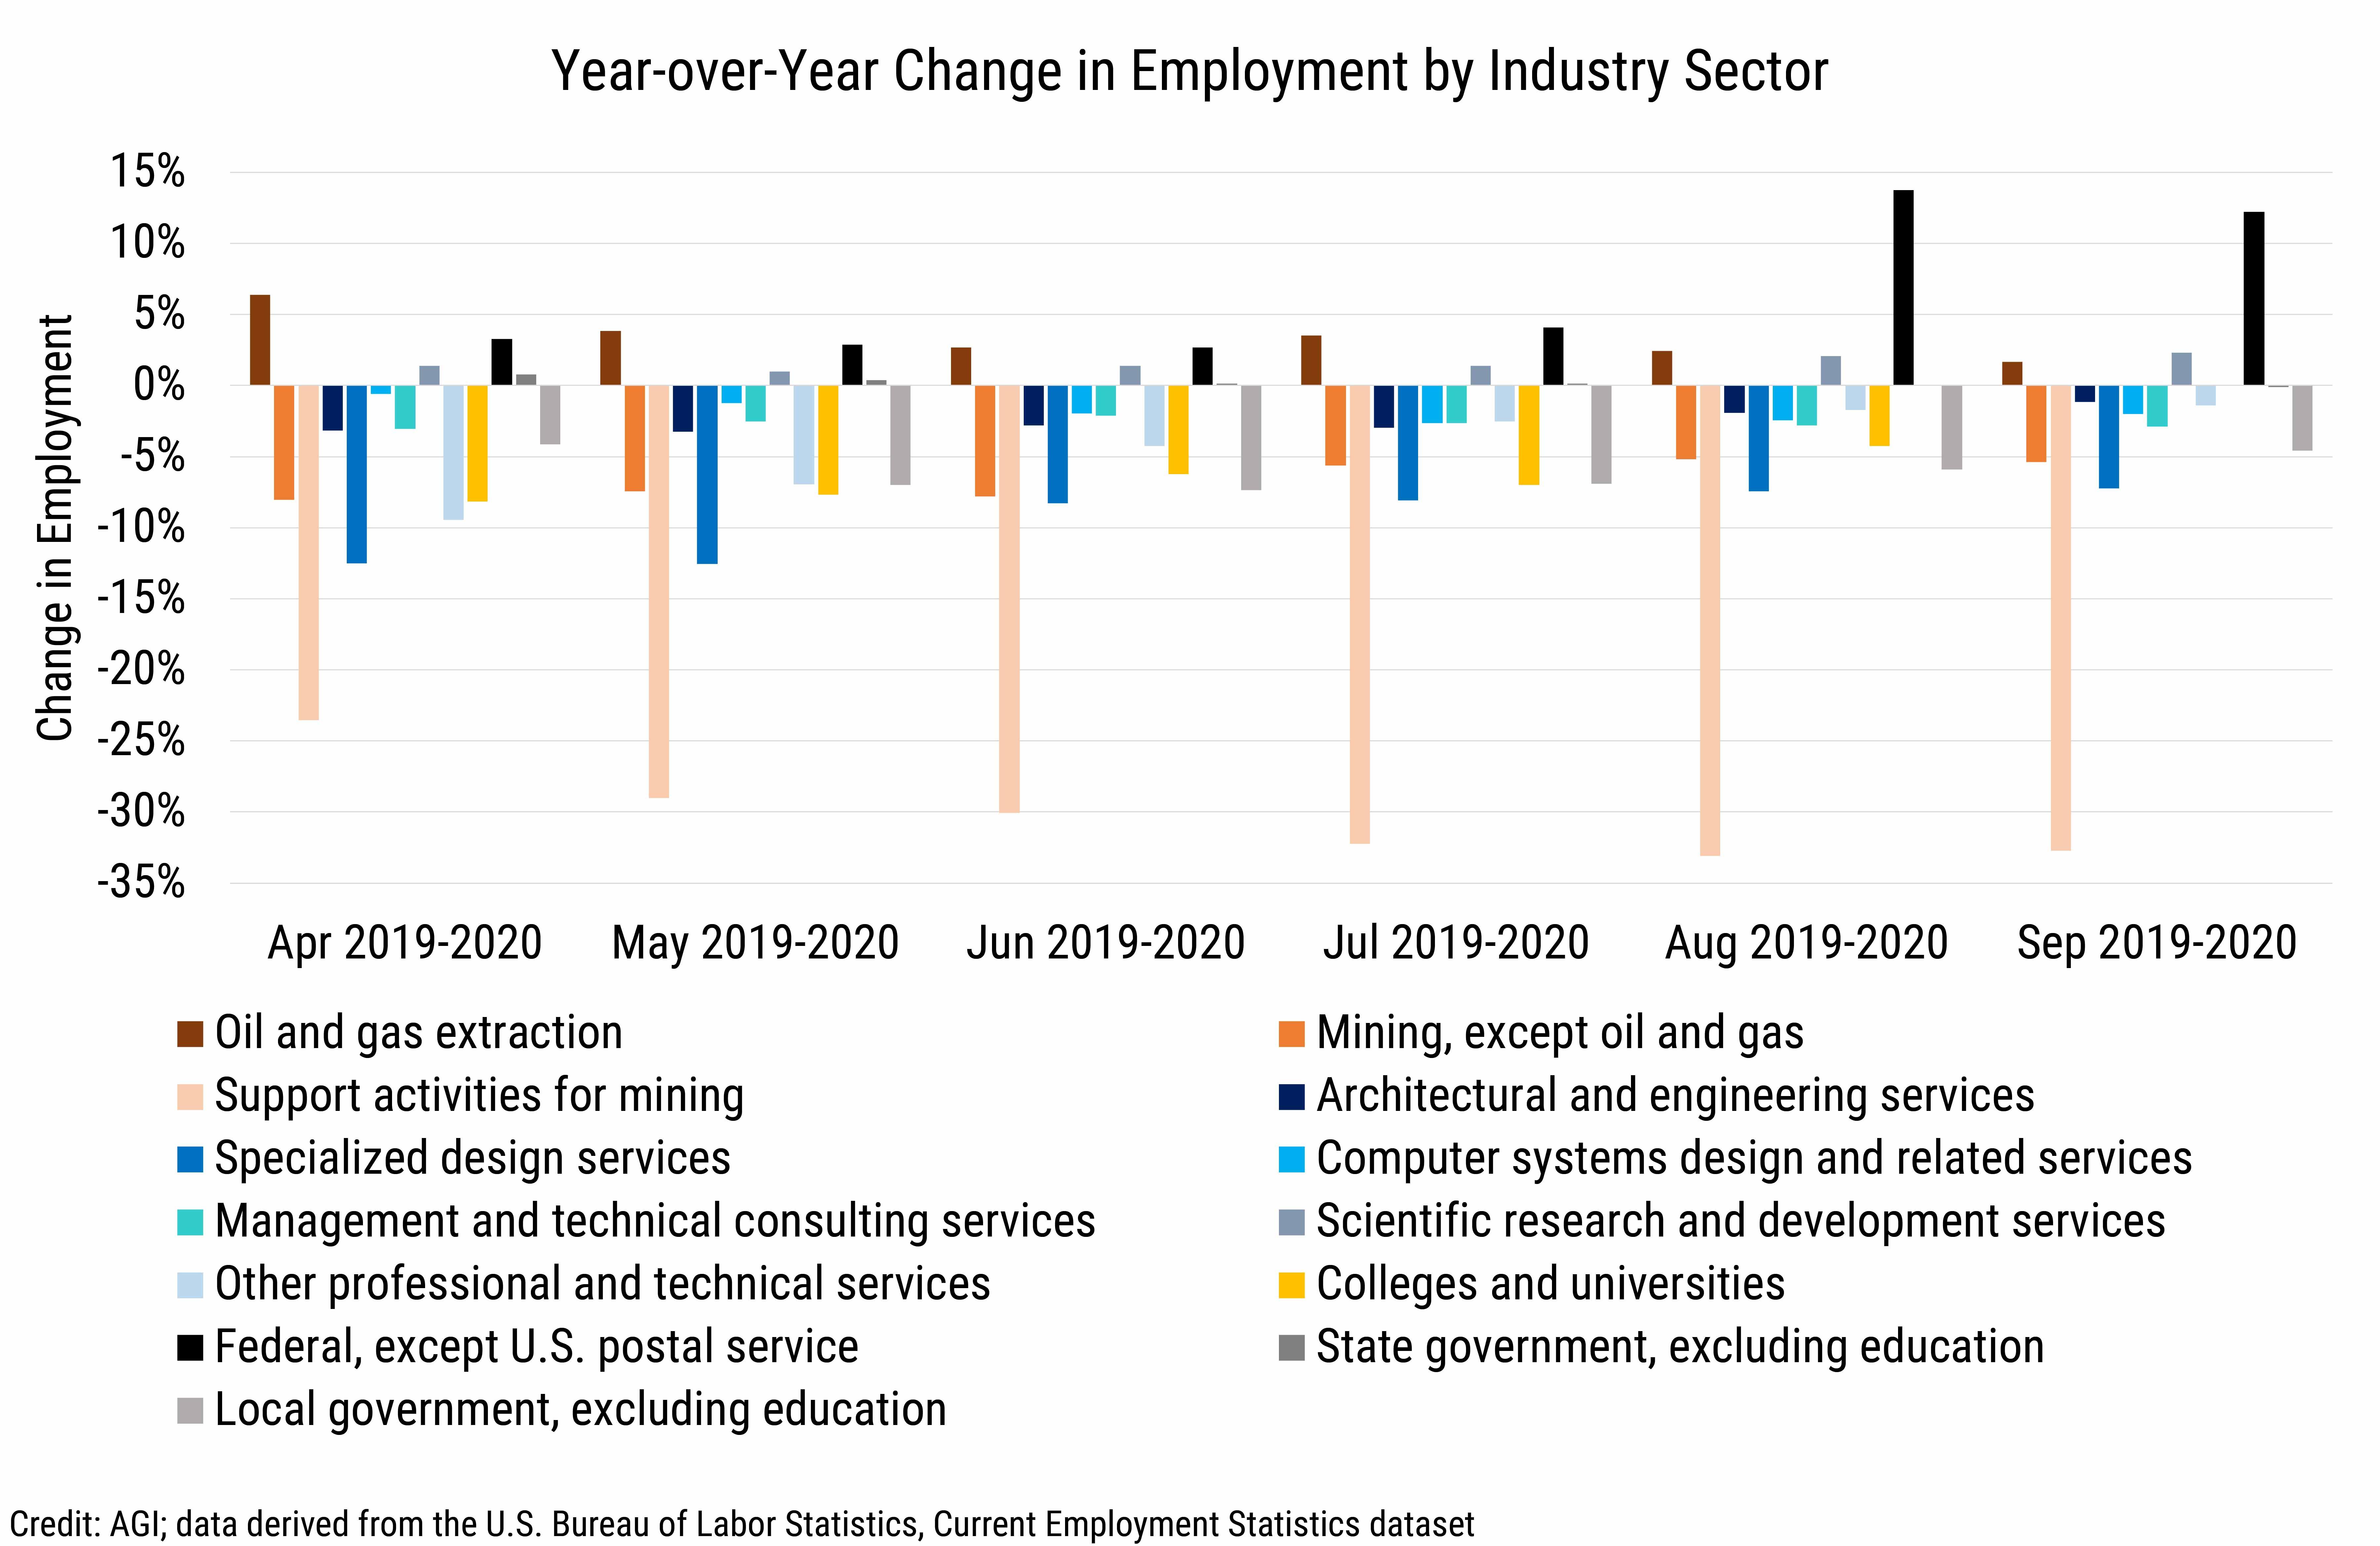 DB_2020-029 chart01: CES_MonthlyEmployment (credit AGI, data derived from the U.S. Bureau of Labor Statistics' Current Employment Statistics dataset)